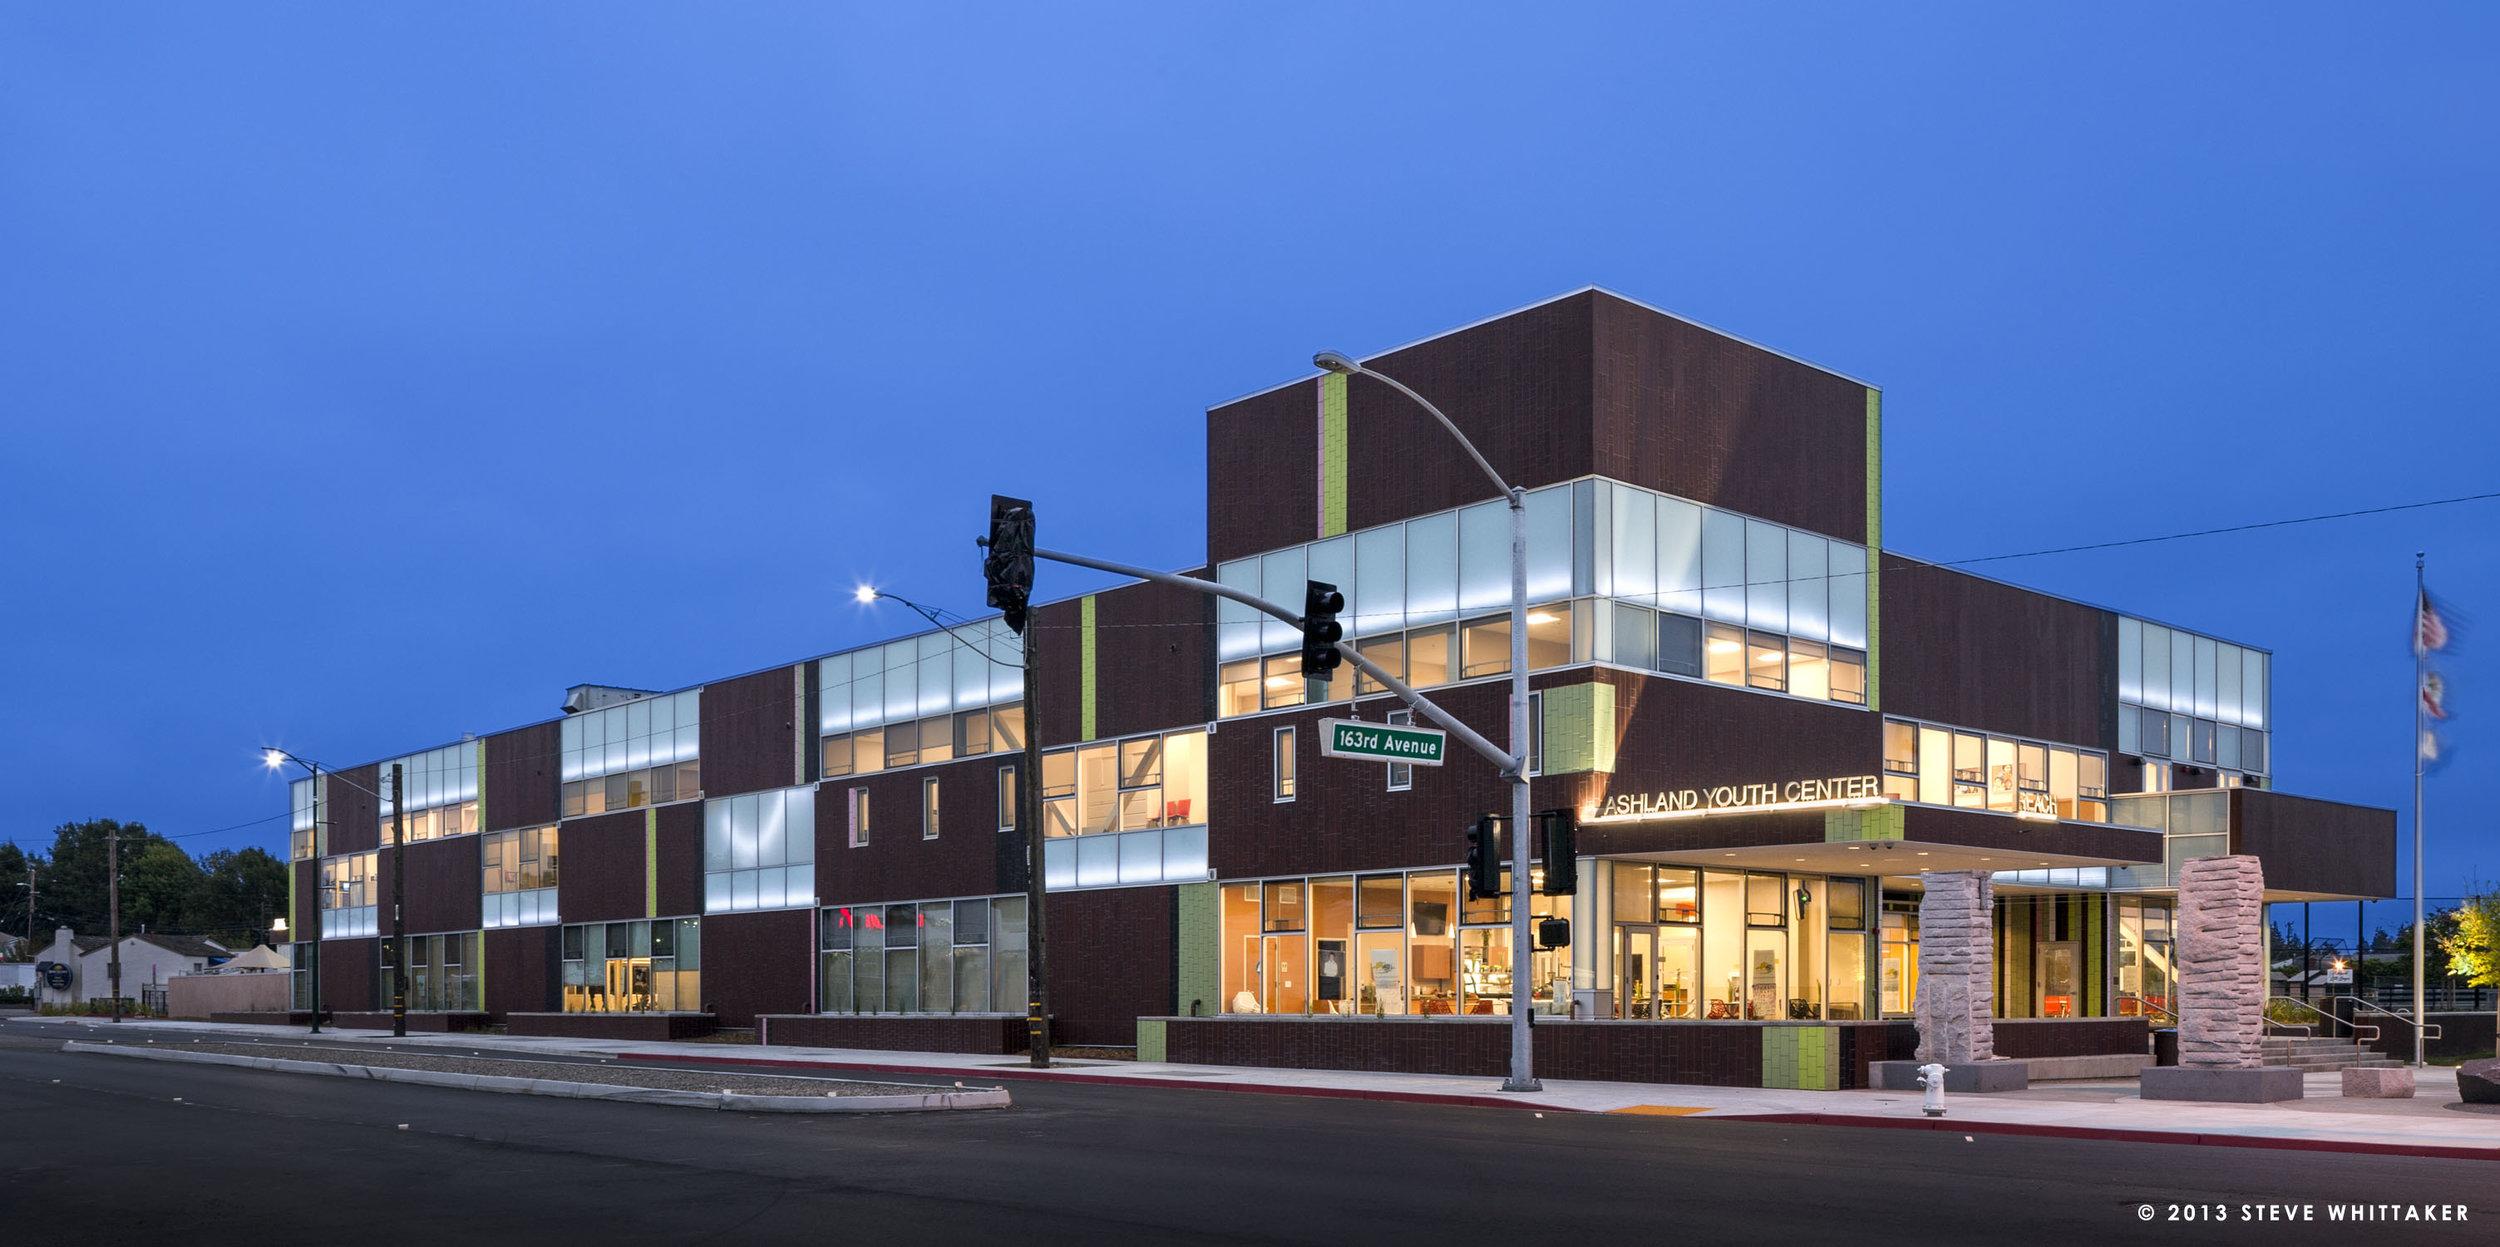 REACH - ASHLAND YOUTH CENTER (W/ NTD ARCHITECTS) - SAN LEANDRO, CA